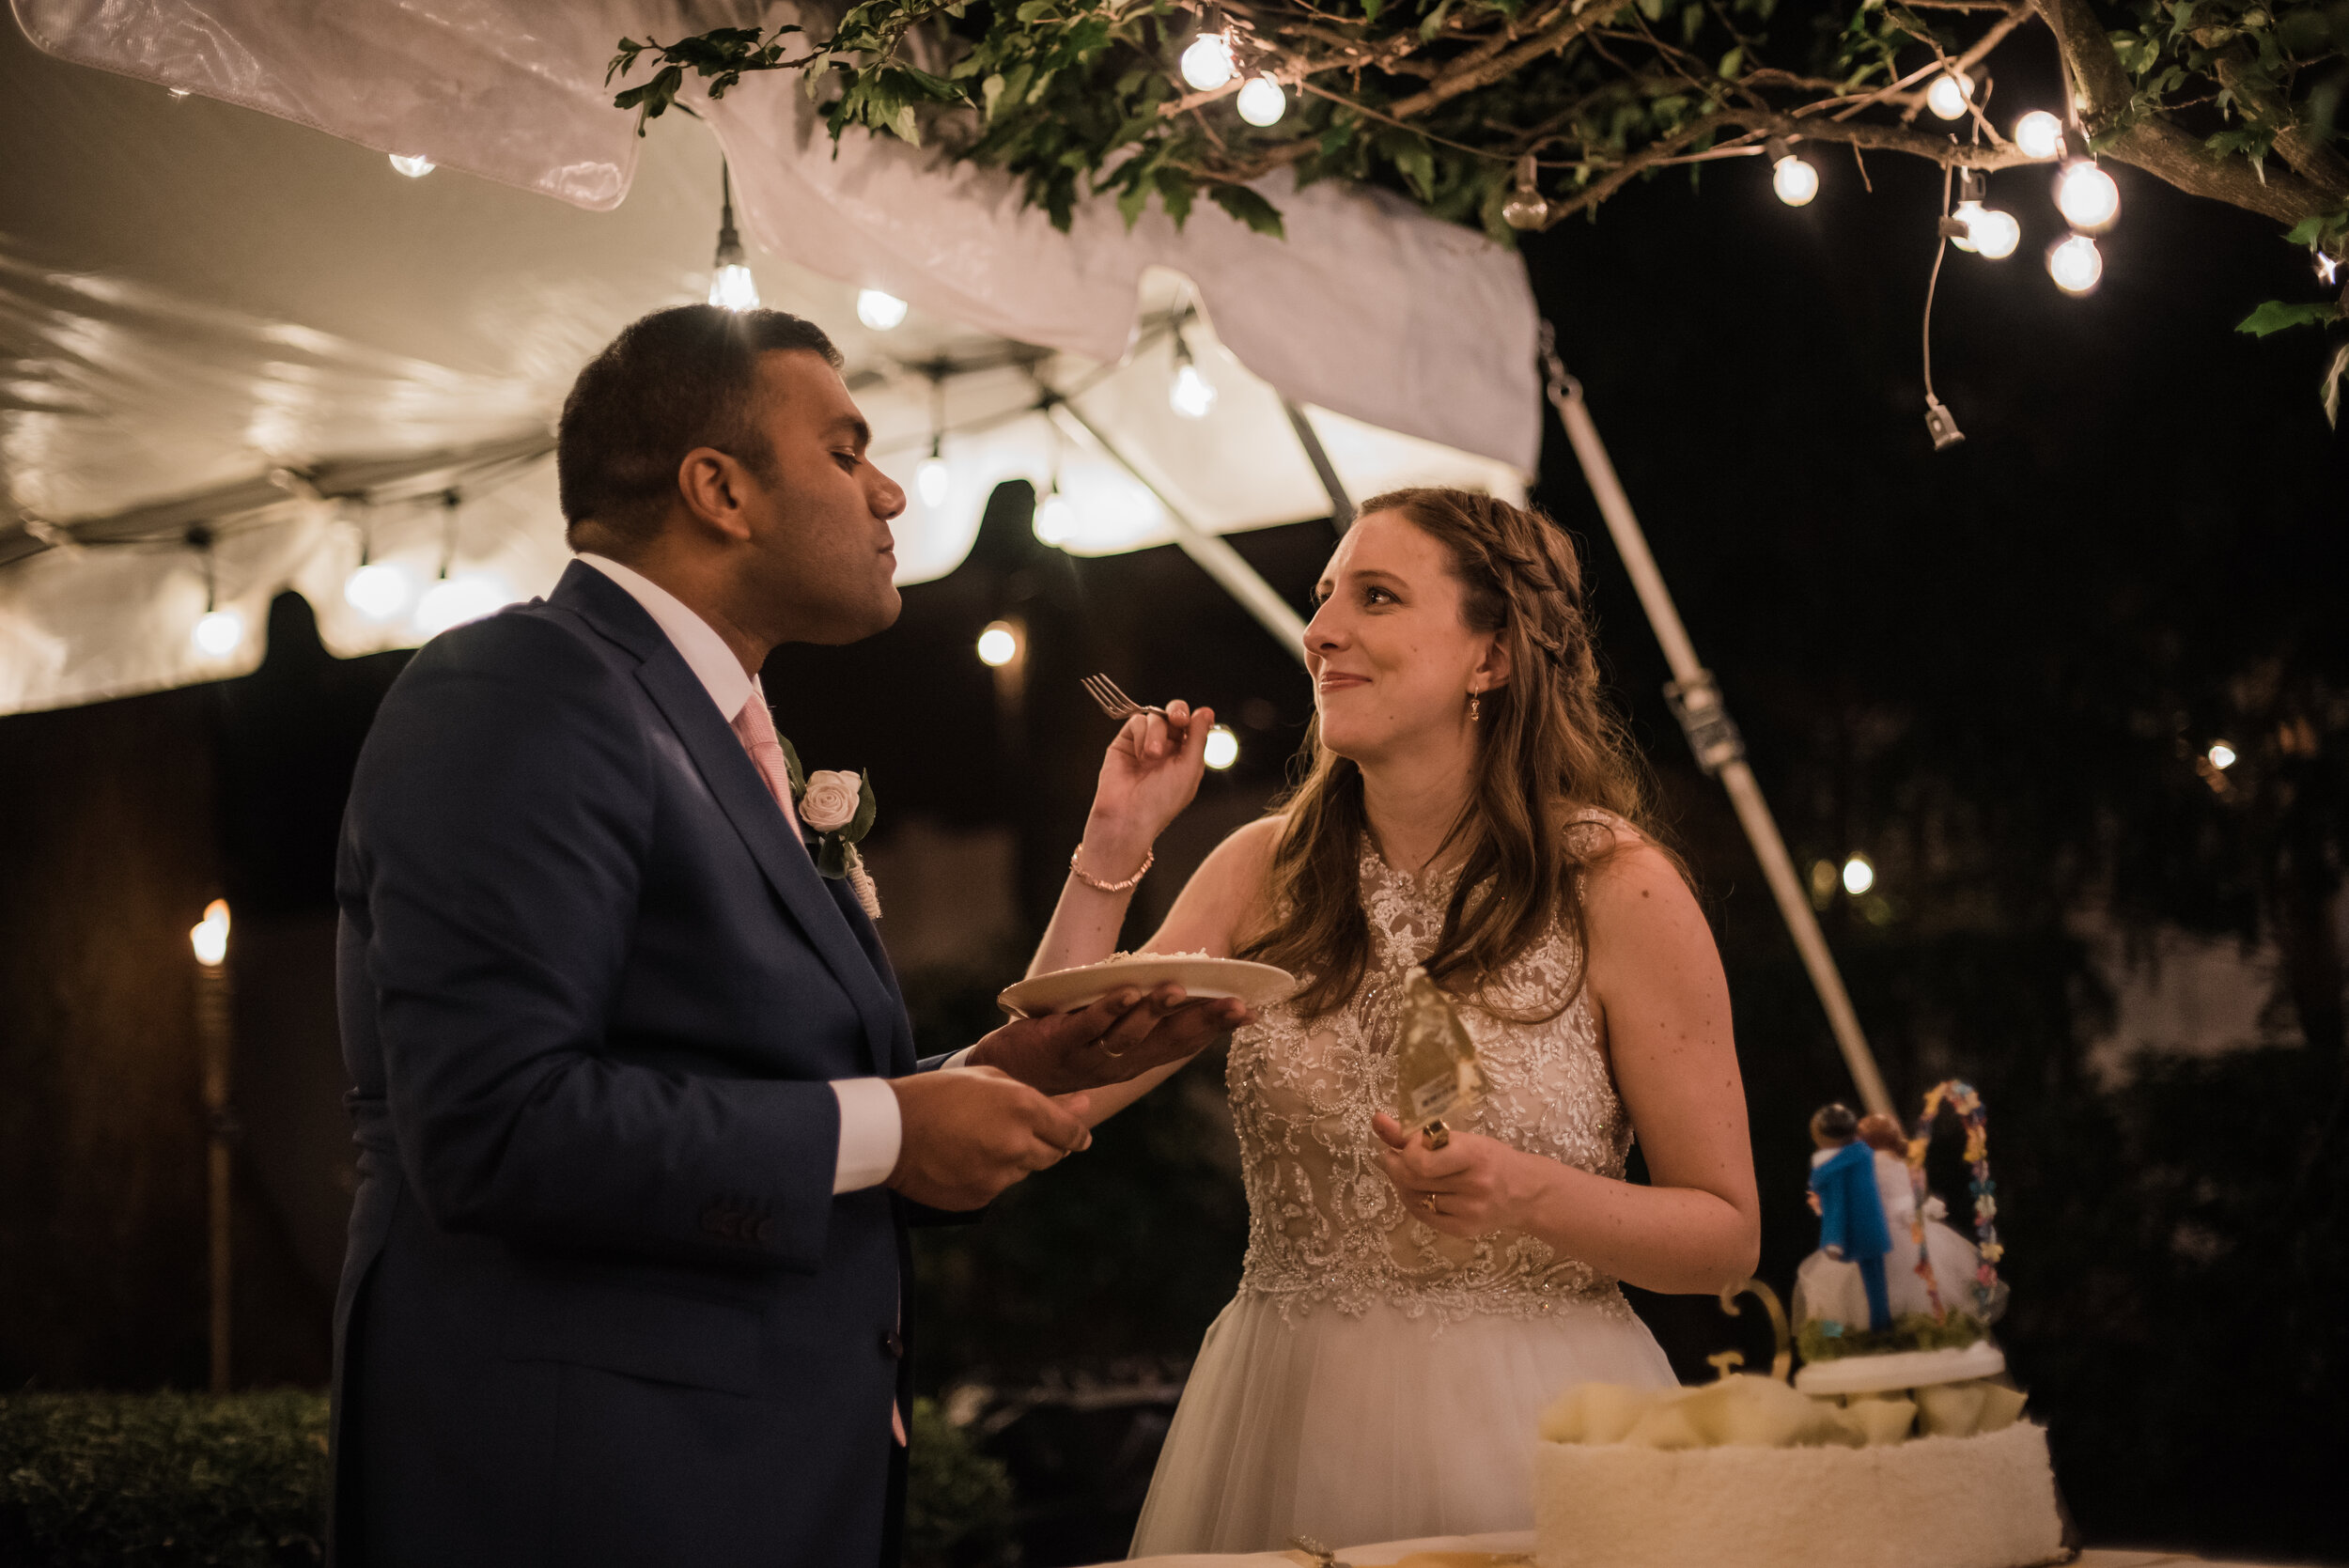 Wedding couple feeding each other cake.